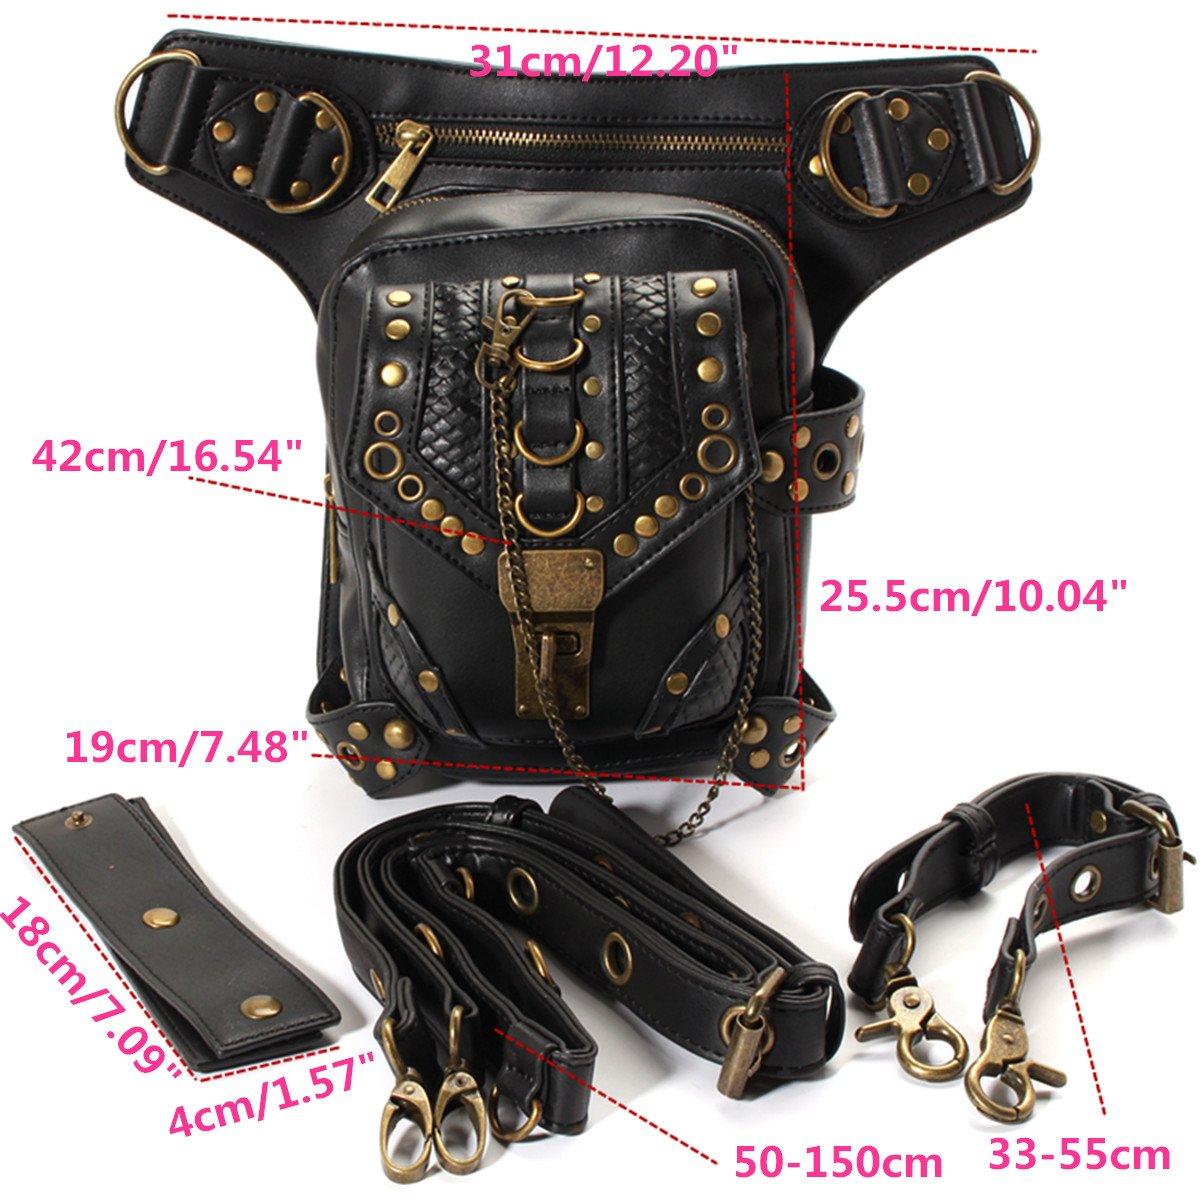 OURBAG Retro Women Steampunk Belt Bag Waist Leg Hip Holster Purse Pouch Packs Black Medium